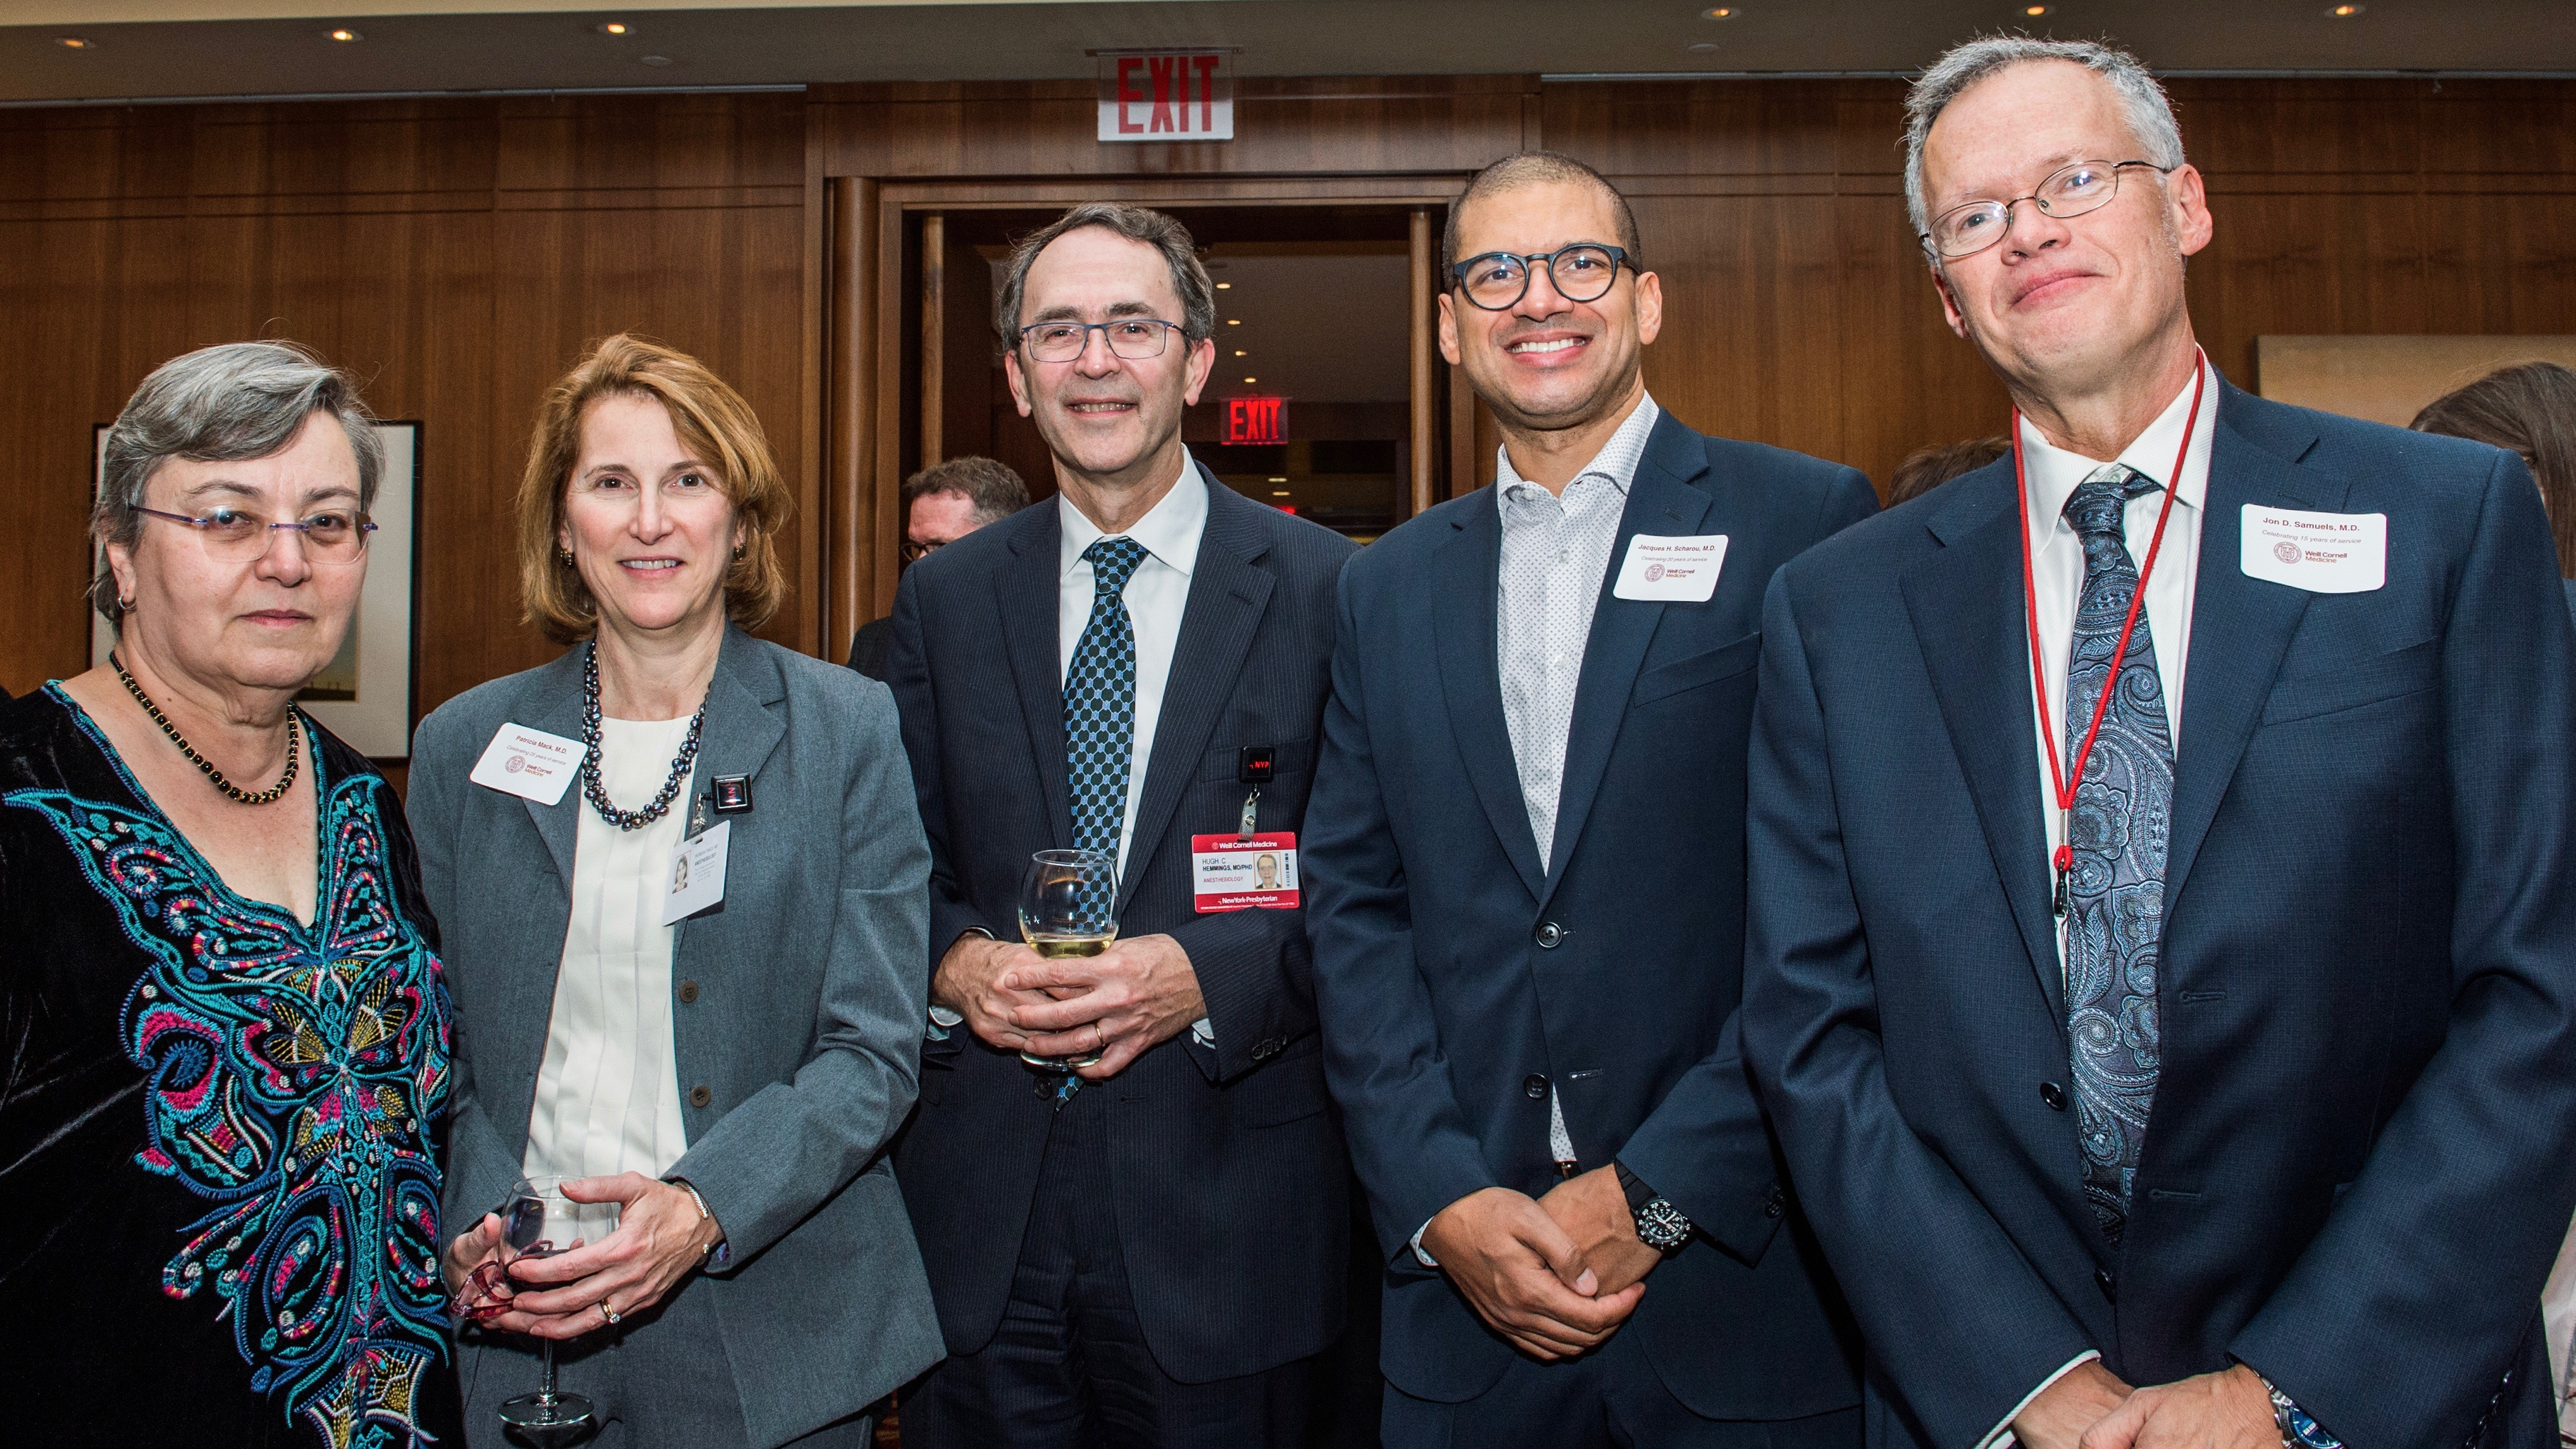 From left: Drs. Gadalla, Mack, Hemmings, Scharoun and Samuels.